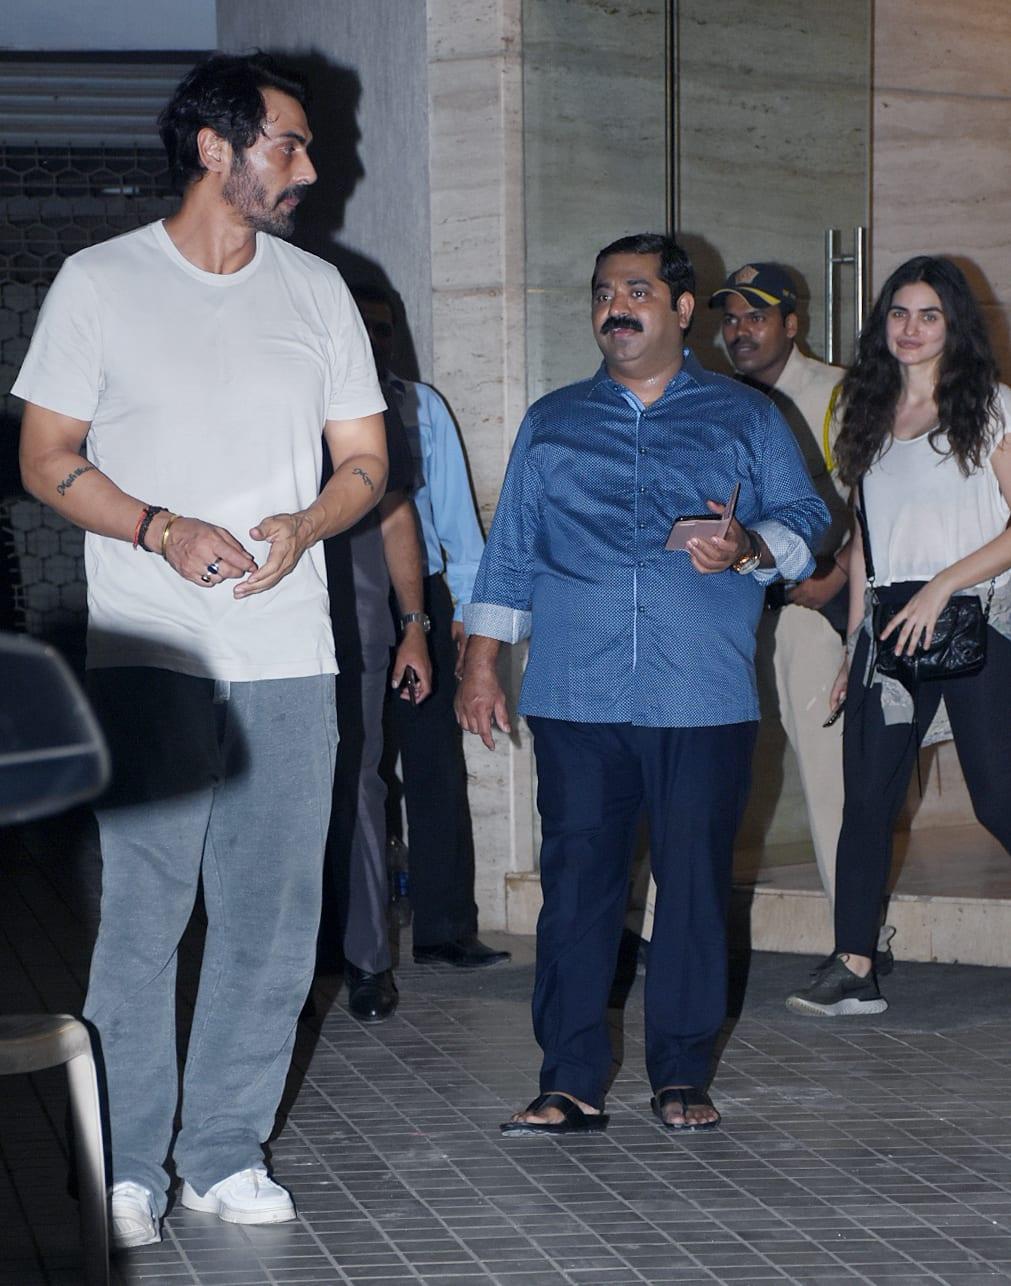 Arjun Rampal with girlfriend Gabriella Demetriades